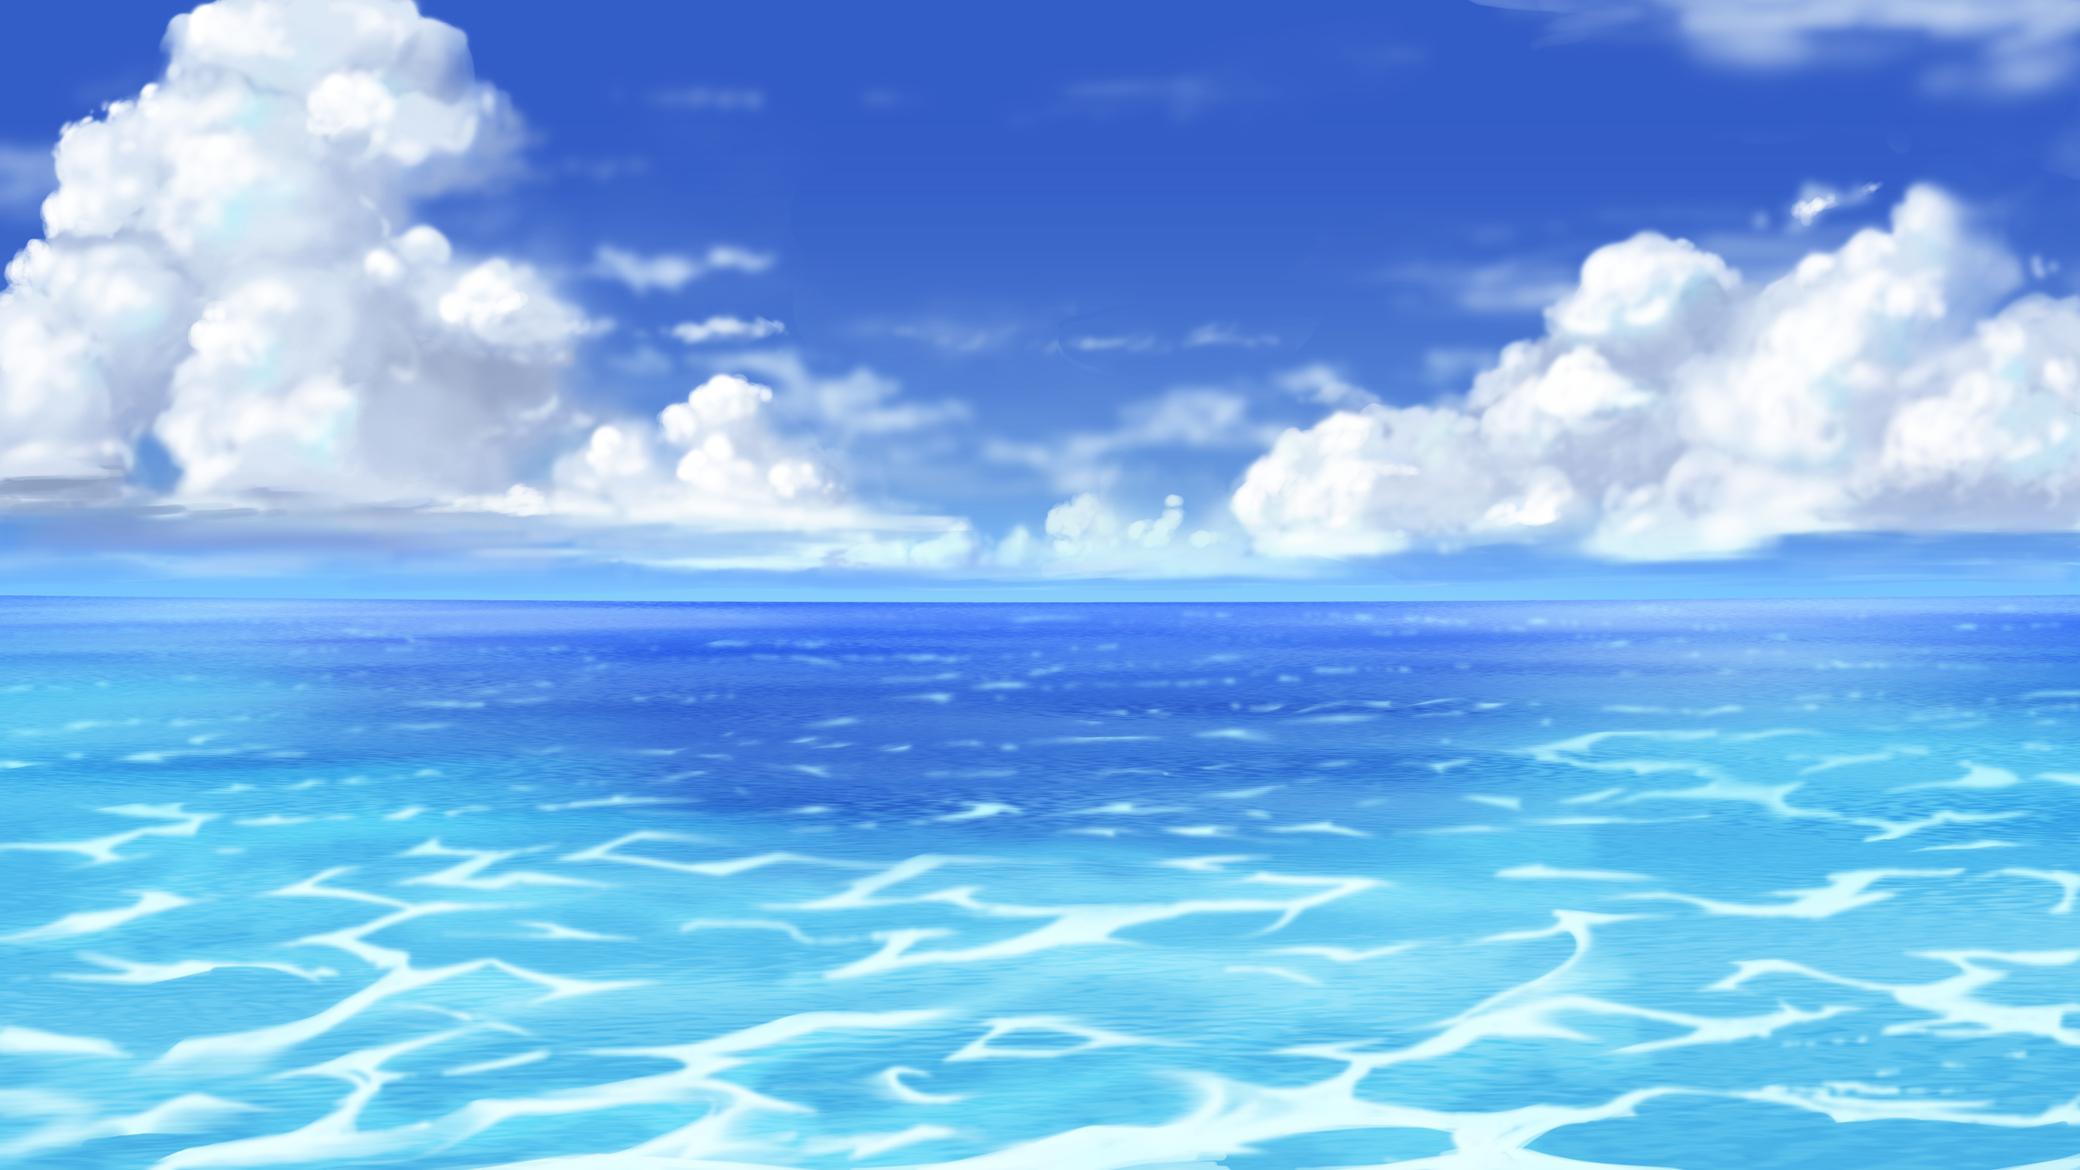 Anime Ocean Background - HD Wallpaper